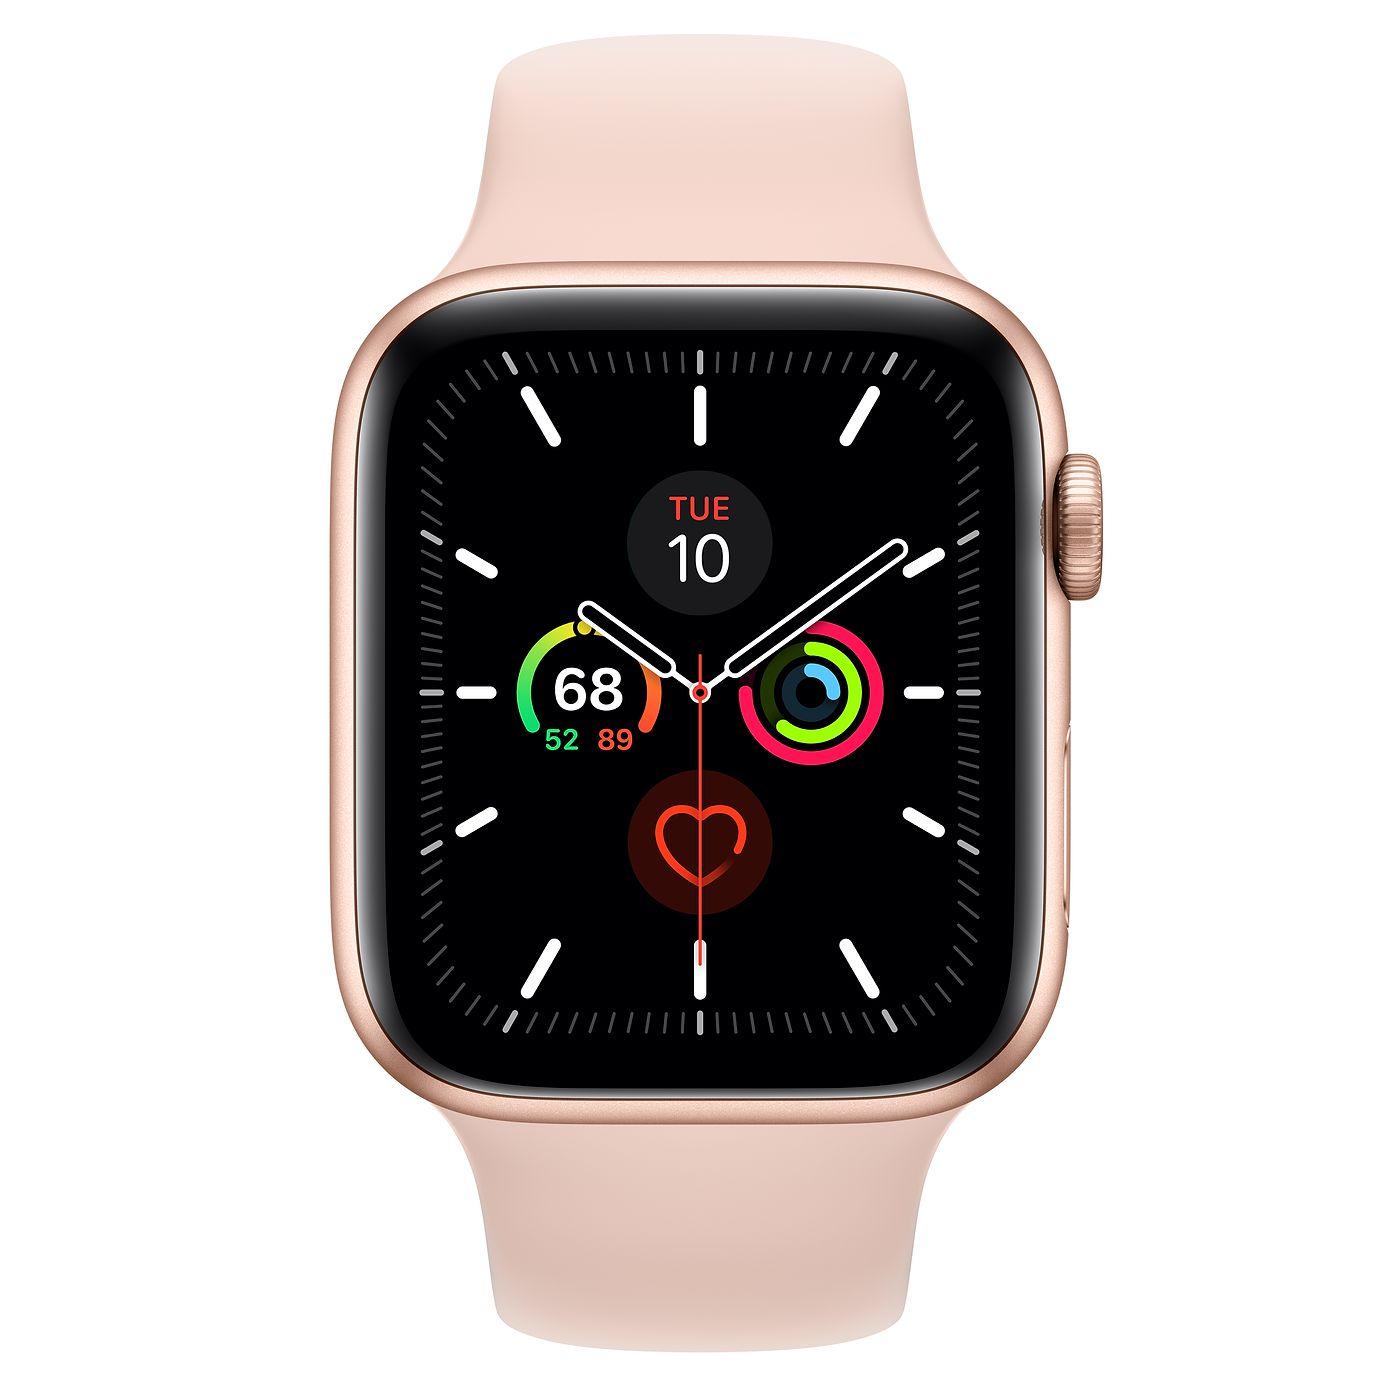 thumbnail 5 - Apple Watch Series 5 (GPS + Cellular) 44mm Smartwatch